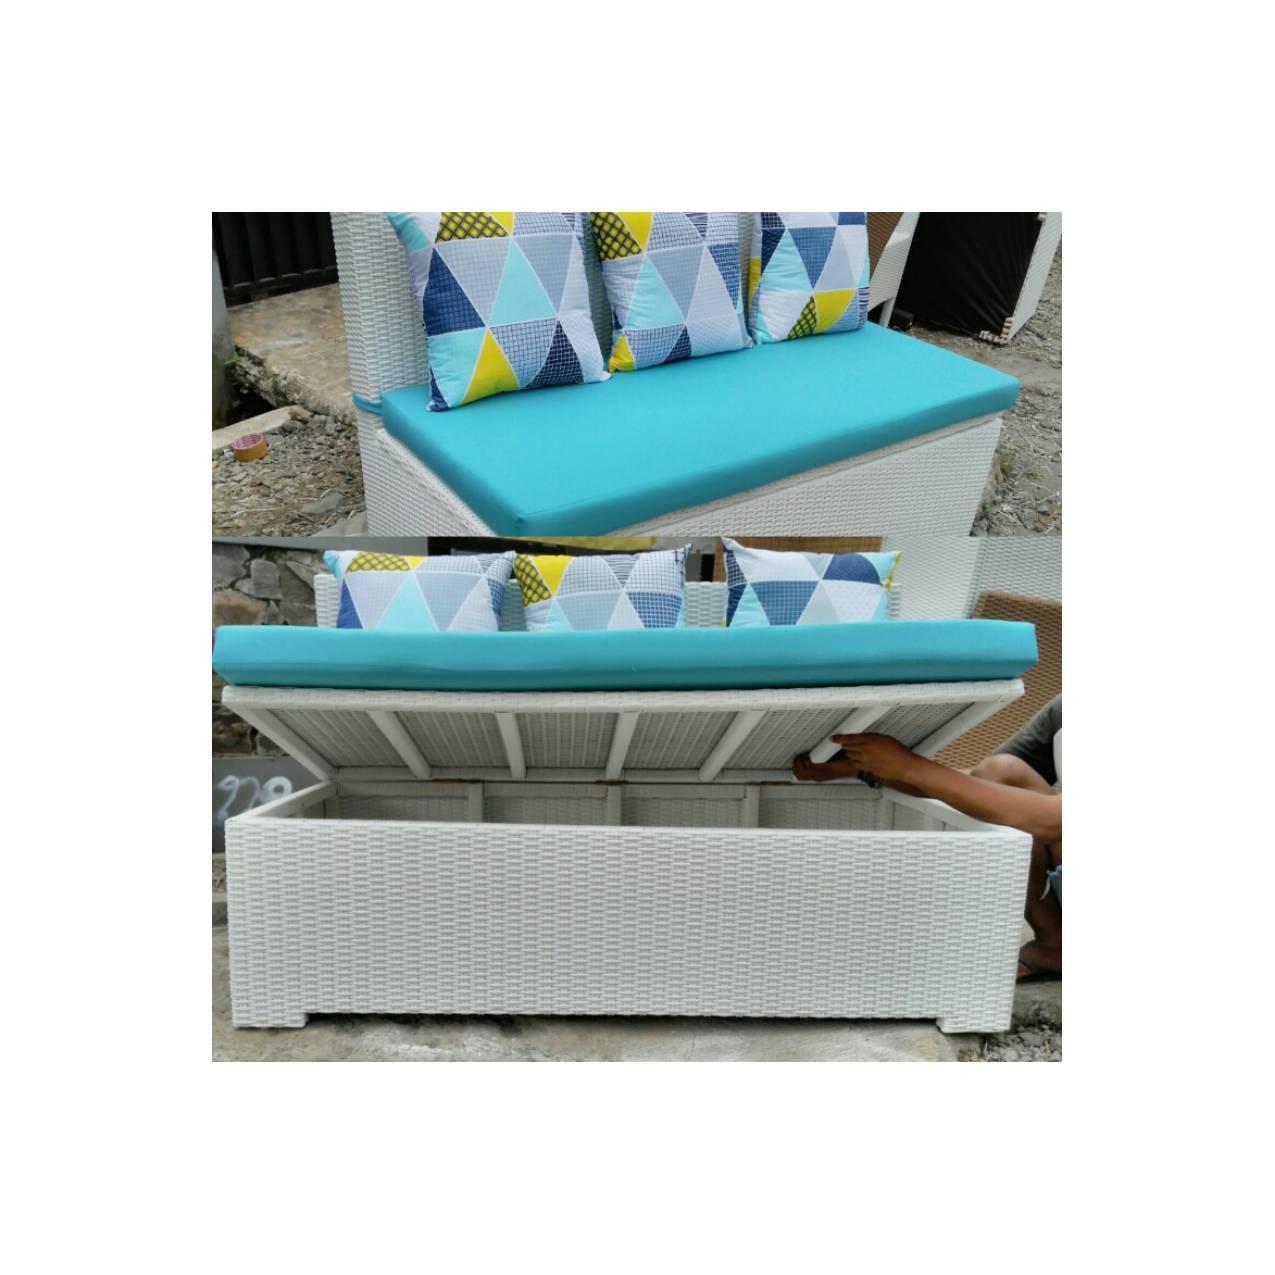 Sofa multi storage 140 x 70 rotan sintetis Shabby